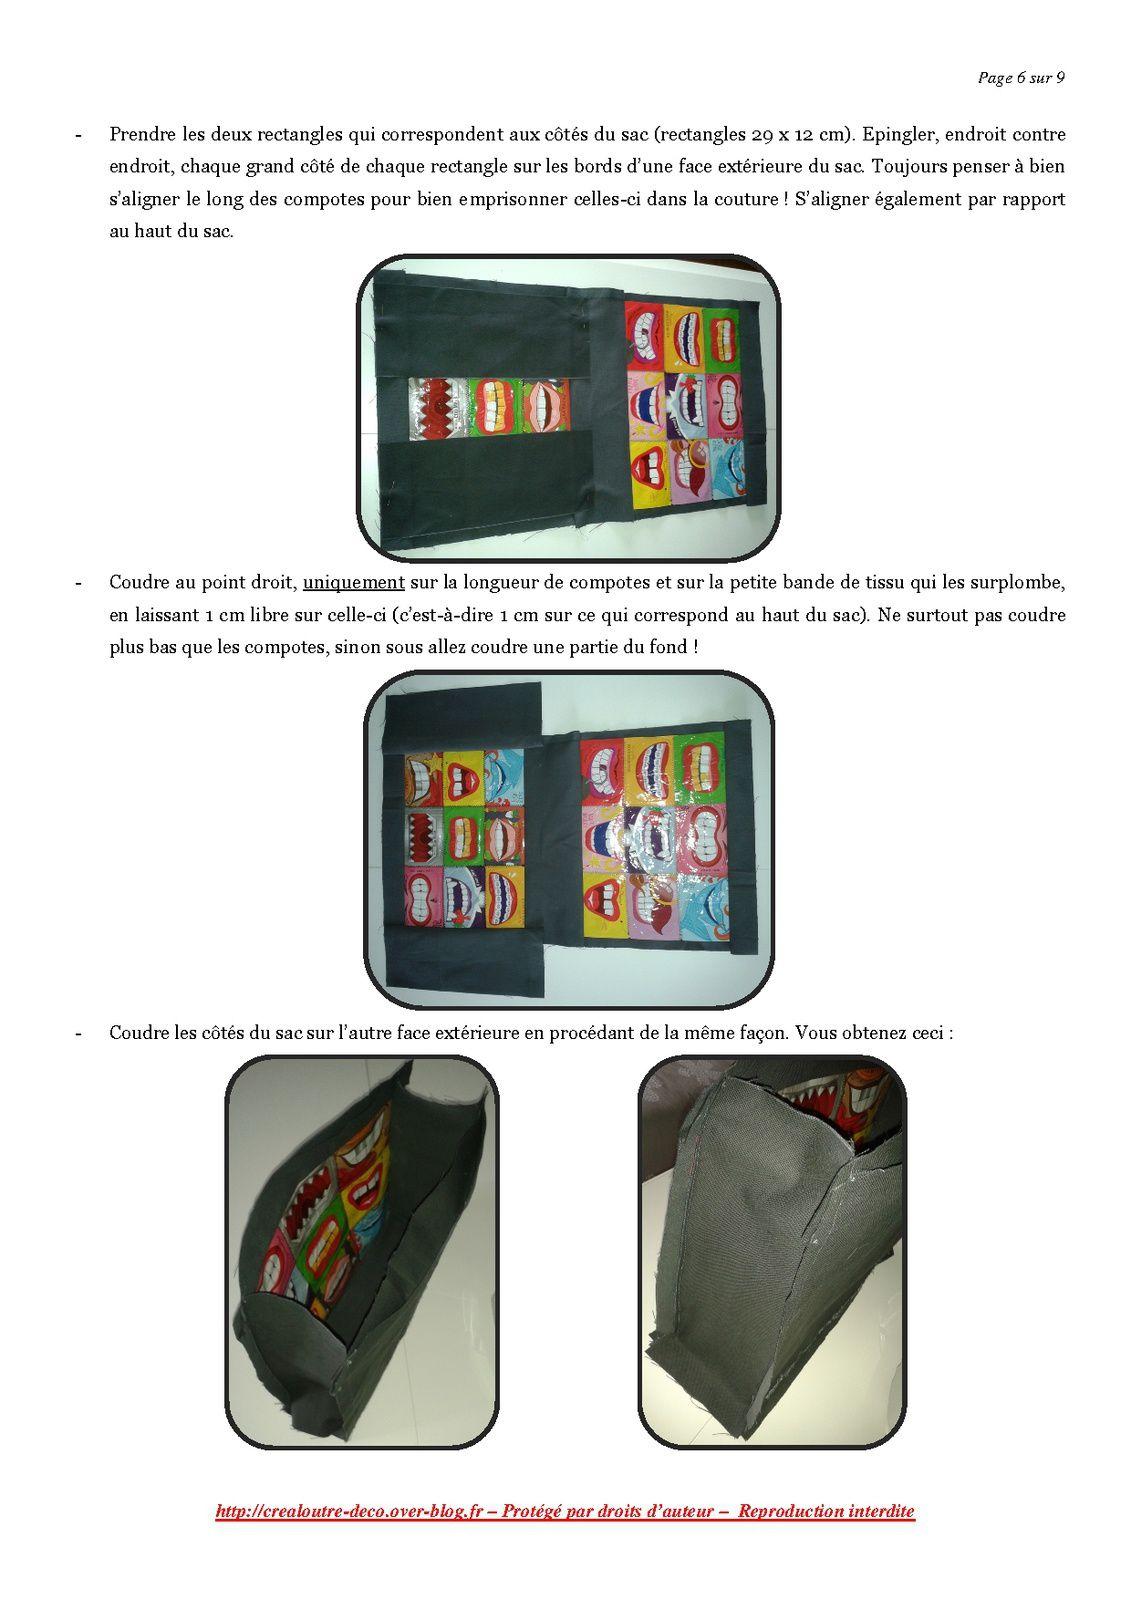 Tuto : le sac récup' de compotes Andros P'tit Dros (upcycling)